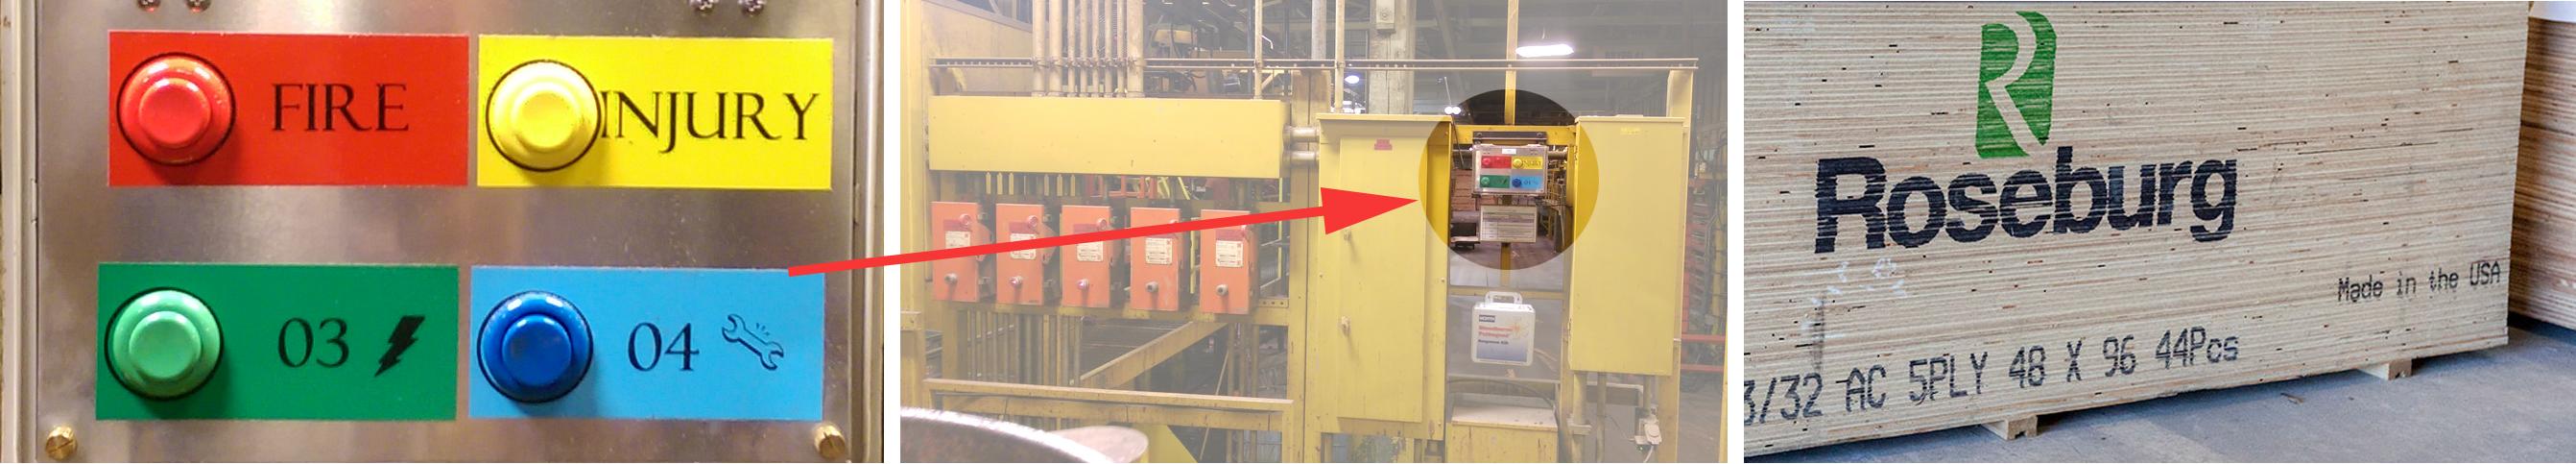 Lumber Mill Adds Wireless Alert System